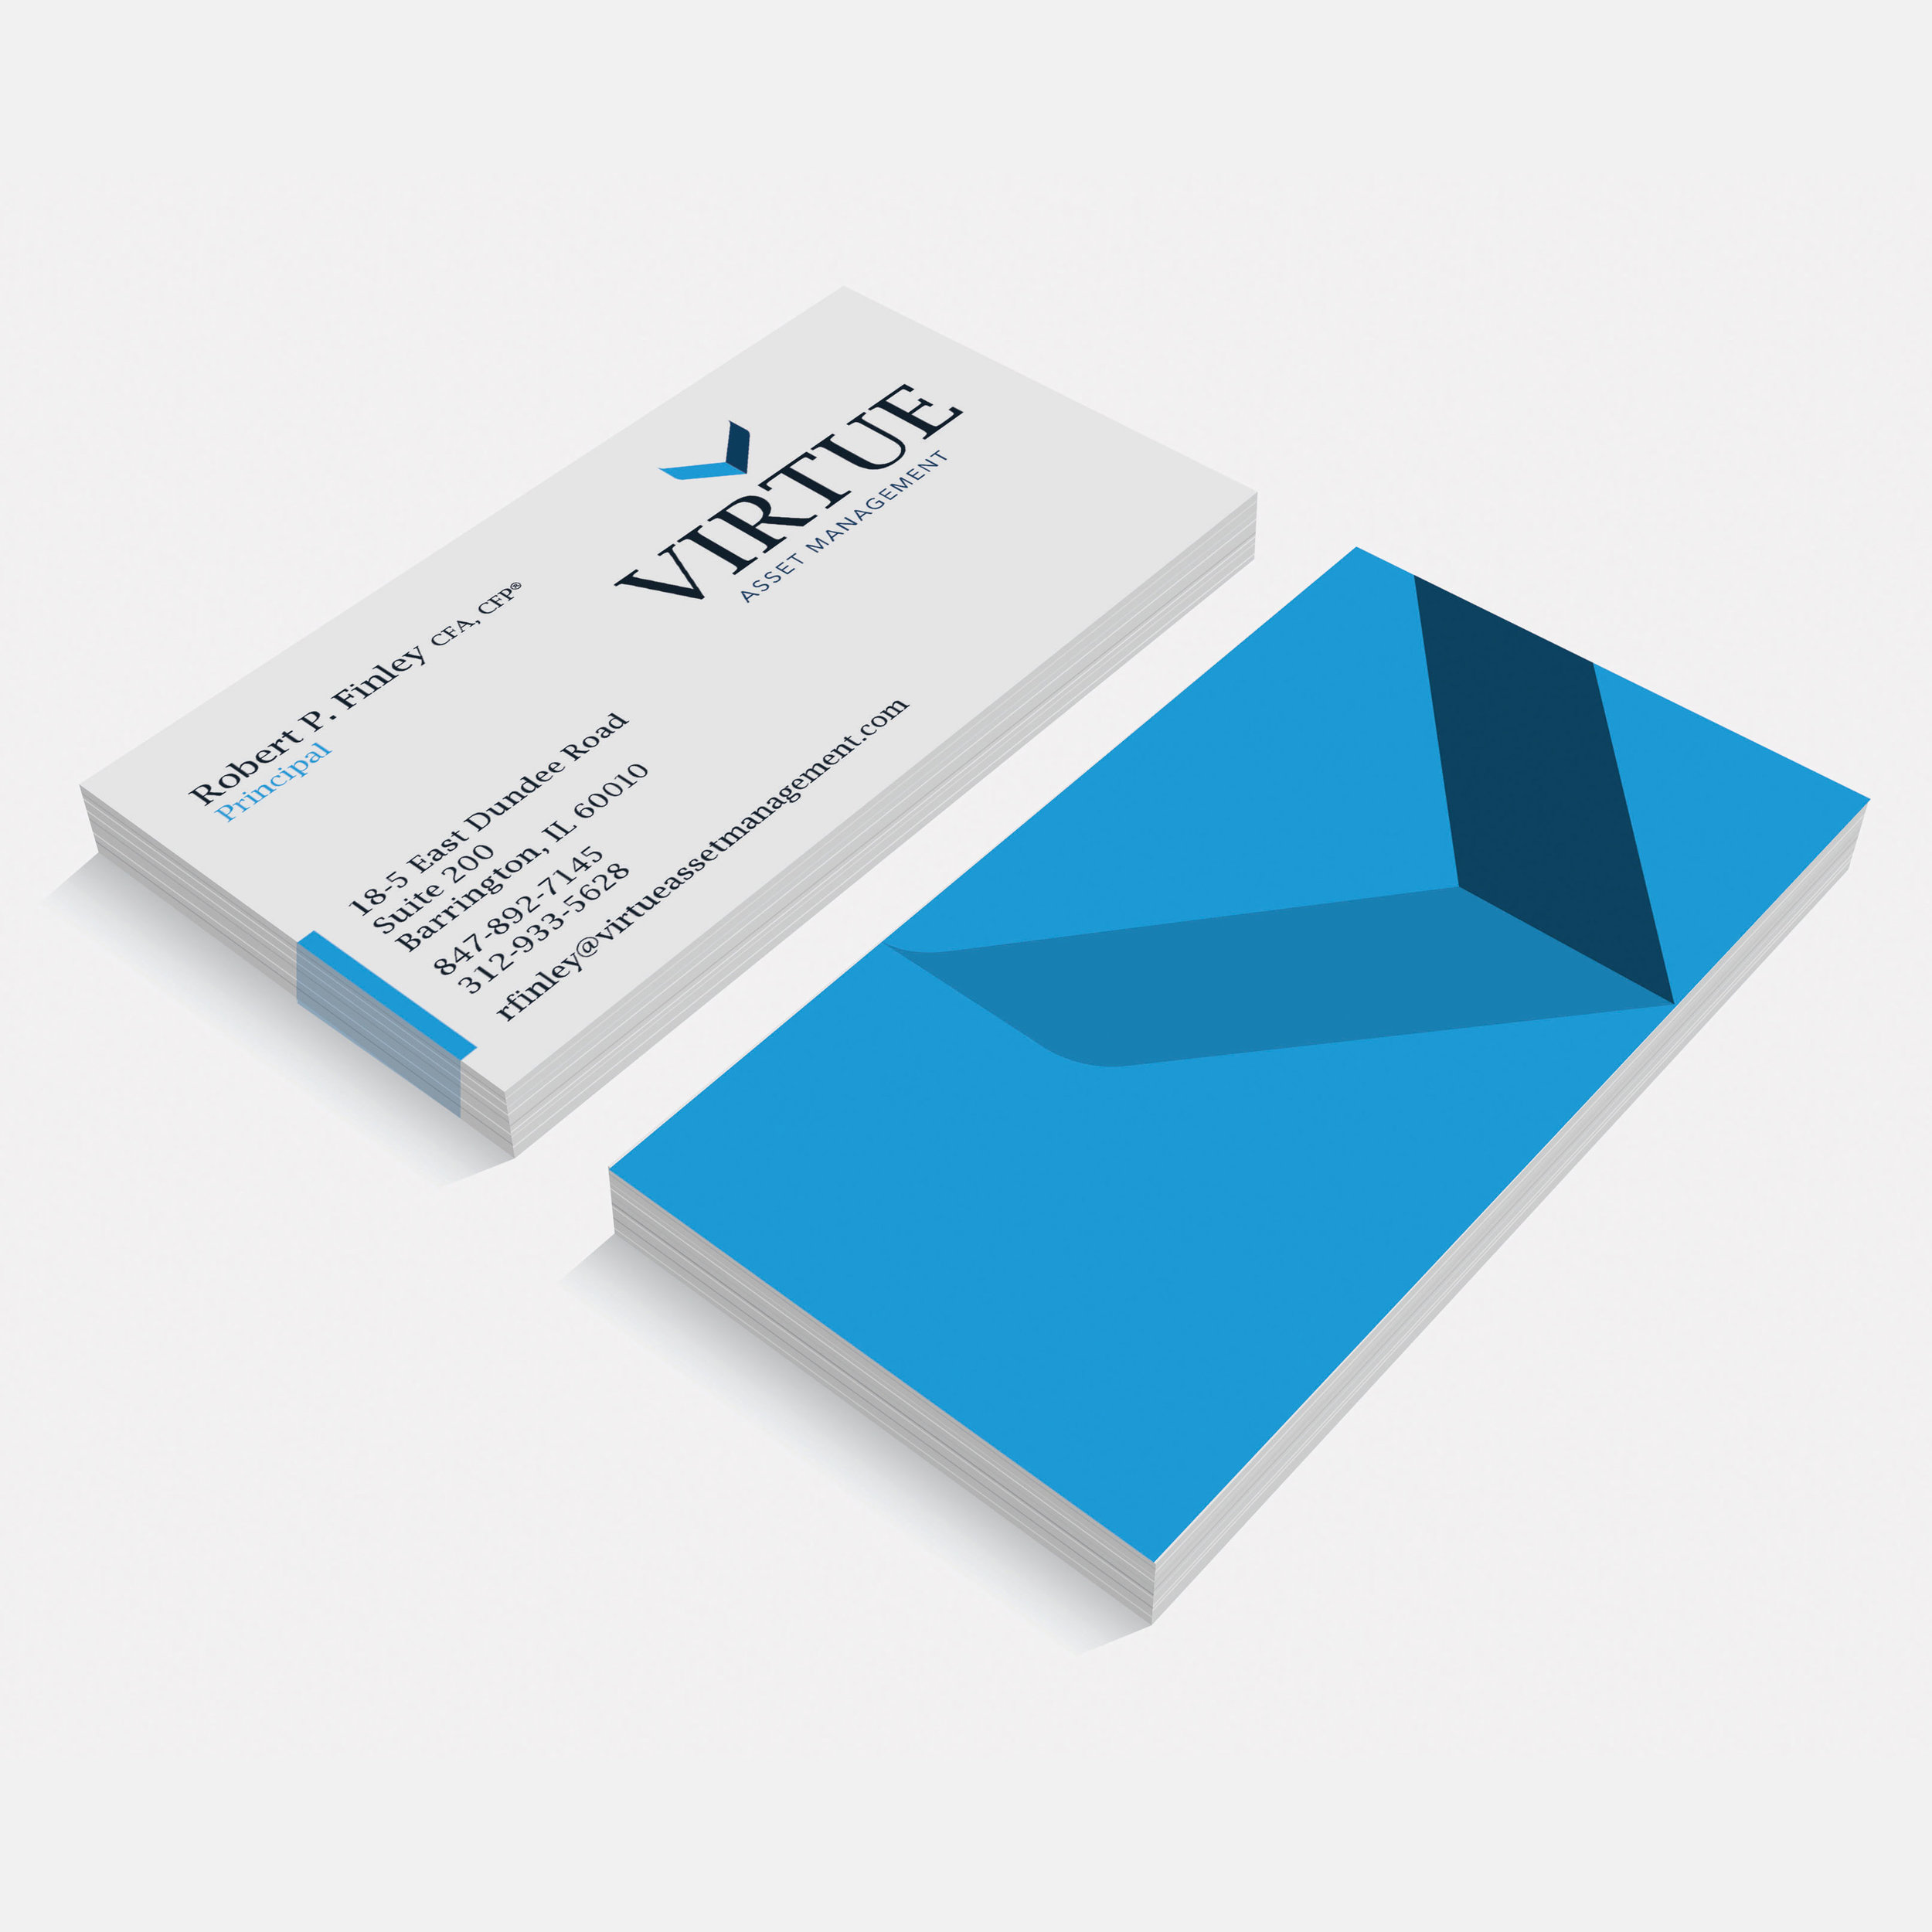 virtue_biz_cards_square.jpg